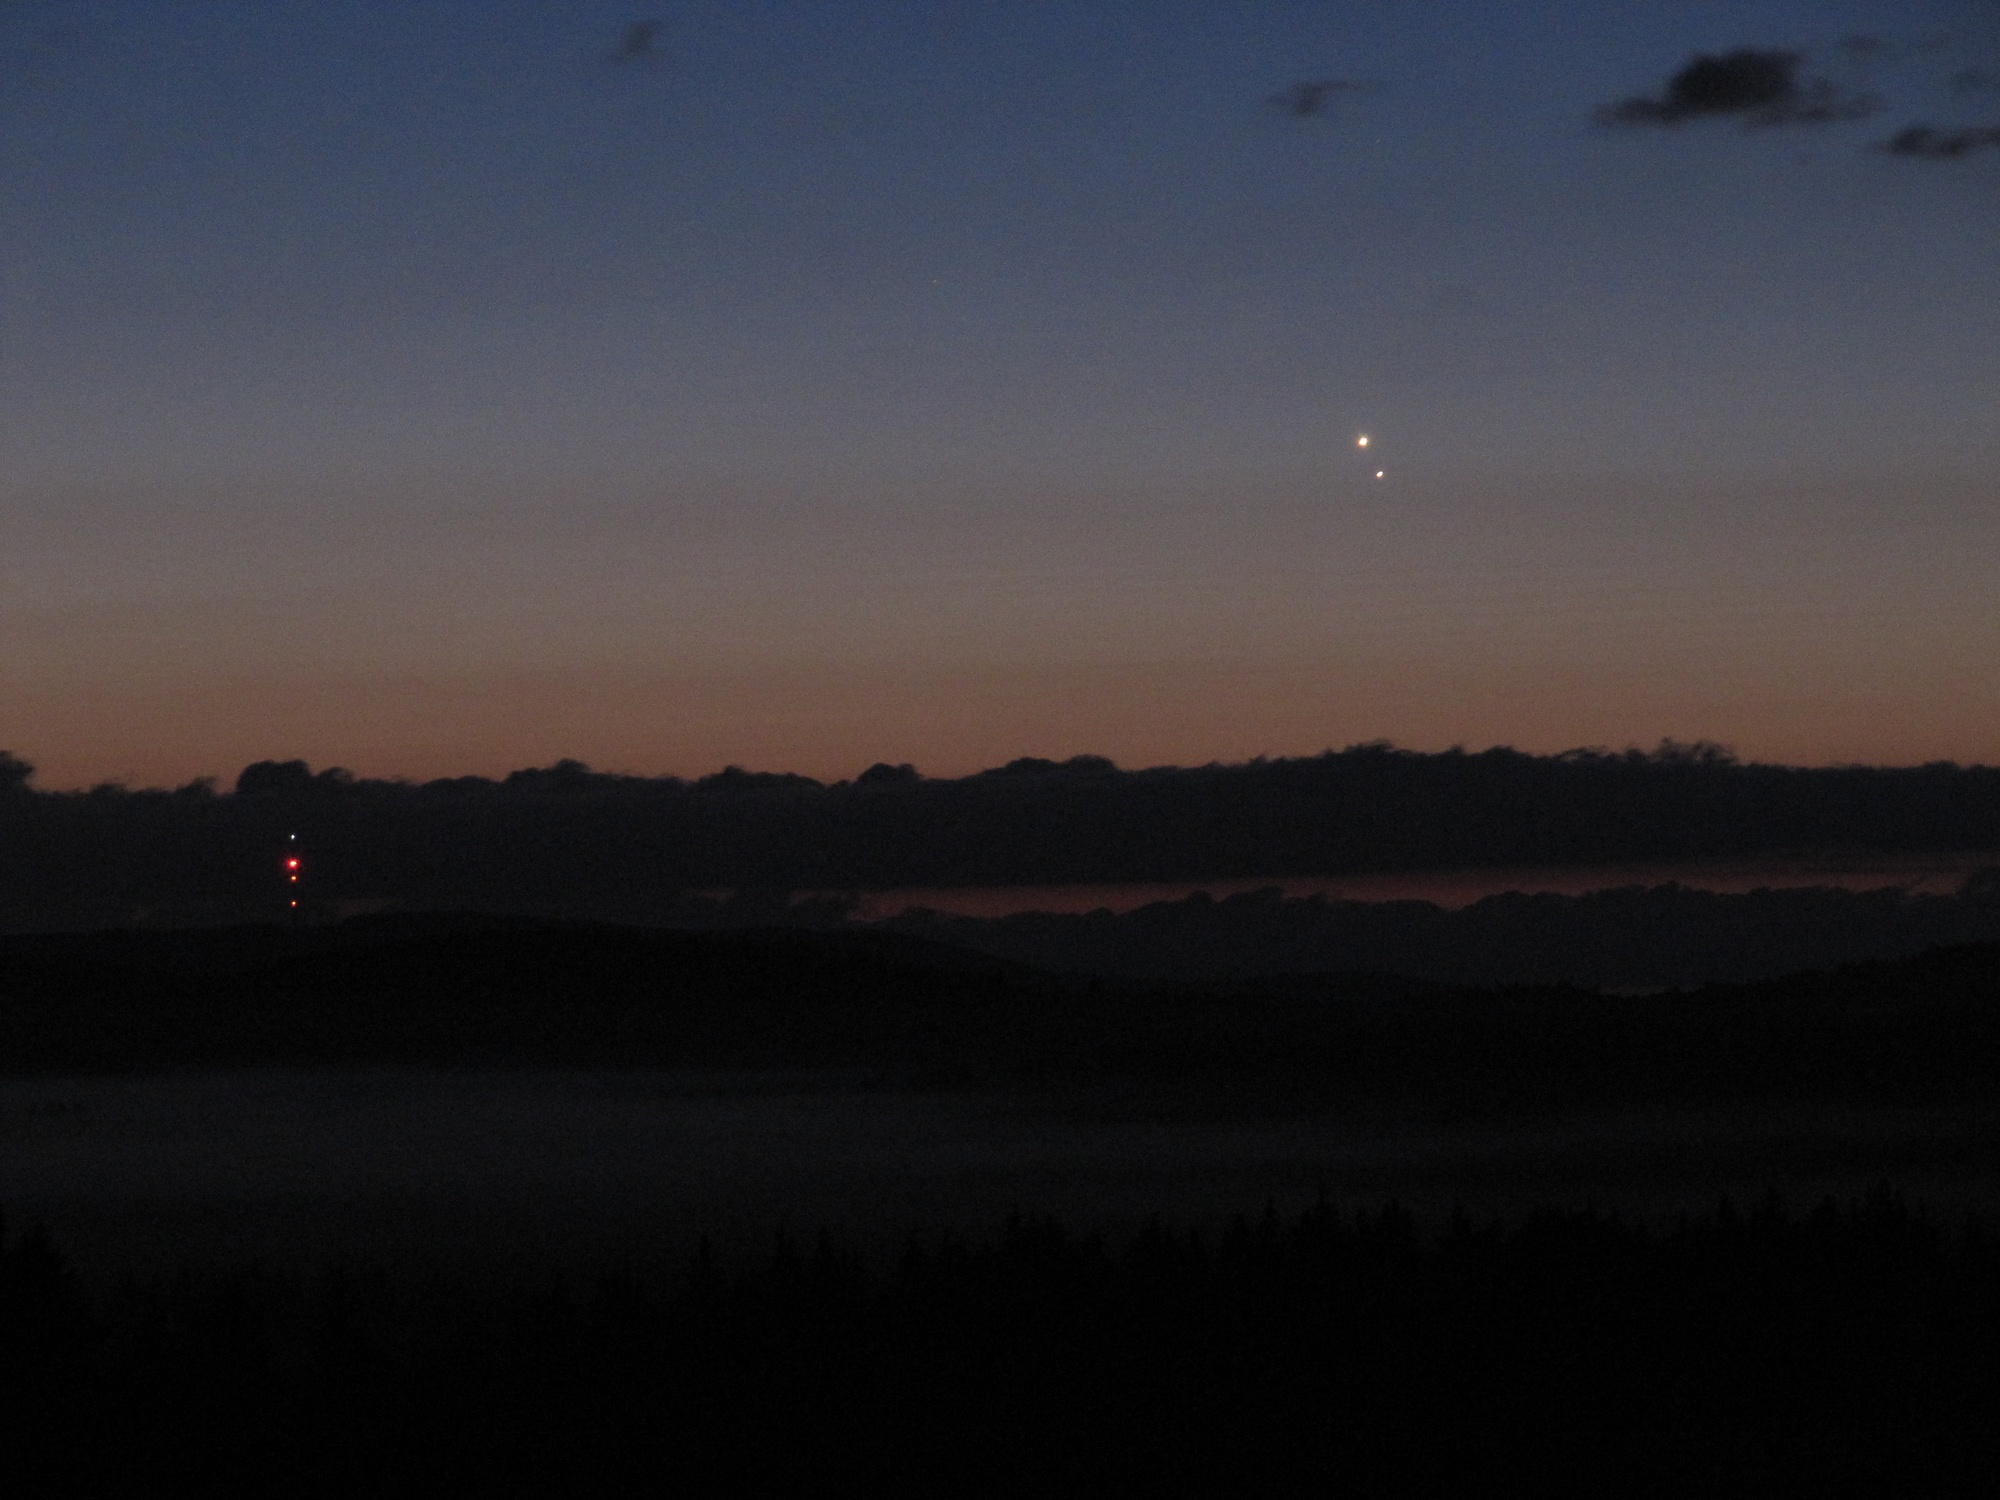 Jupiter, Venuše a Kleť